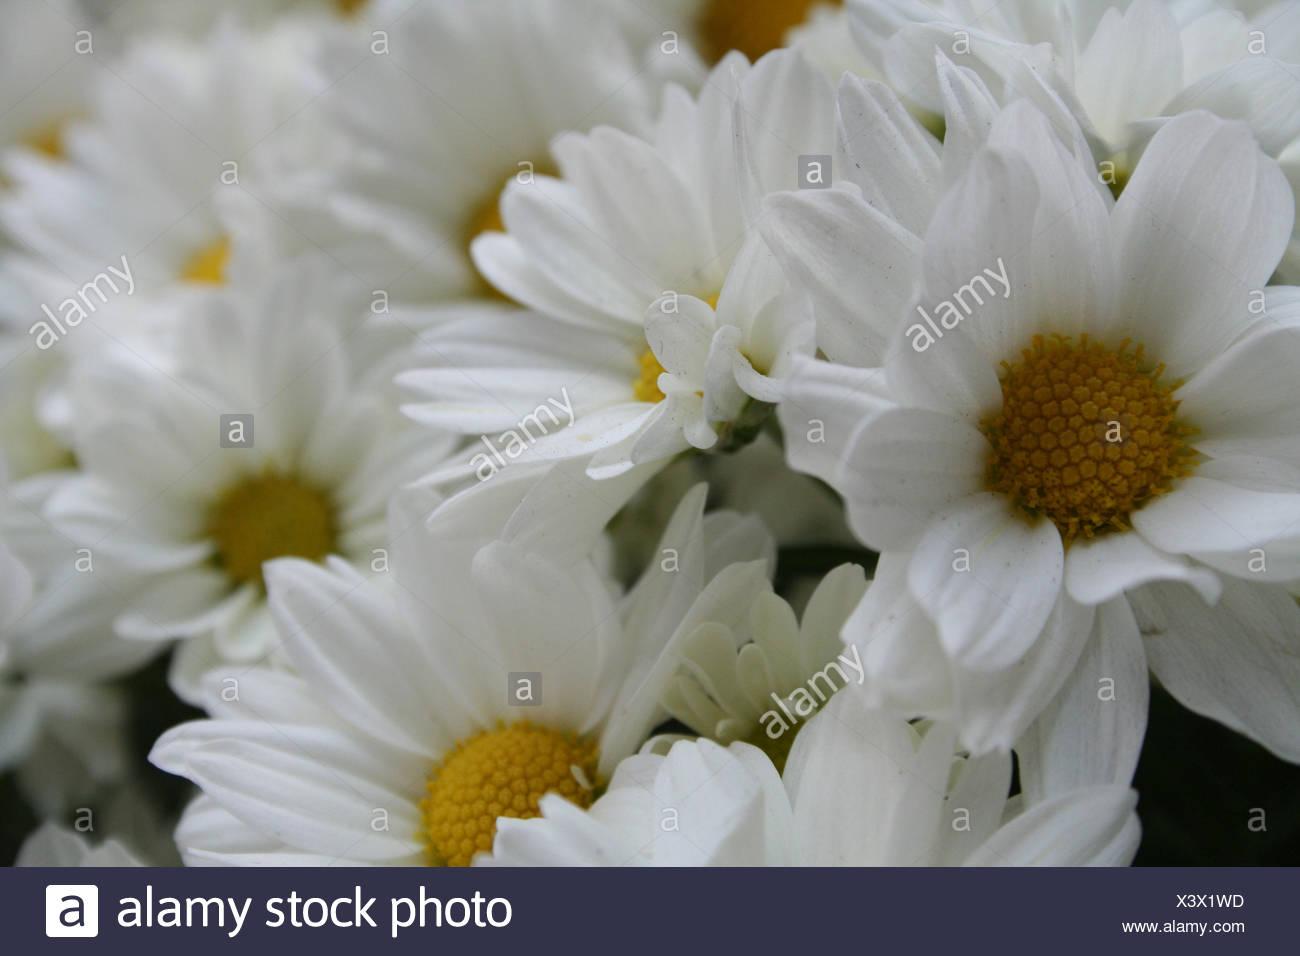 Daisy, Flower, São Paulo, Brazil - Stock Image